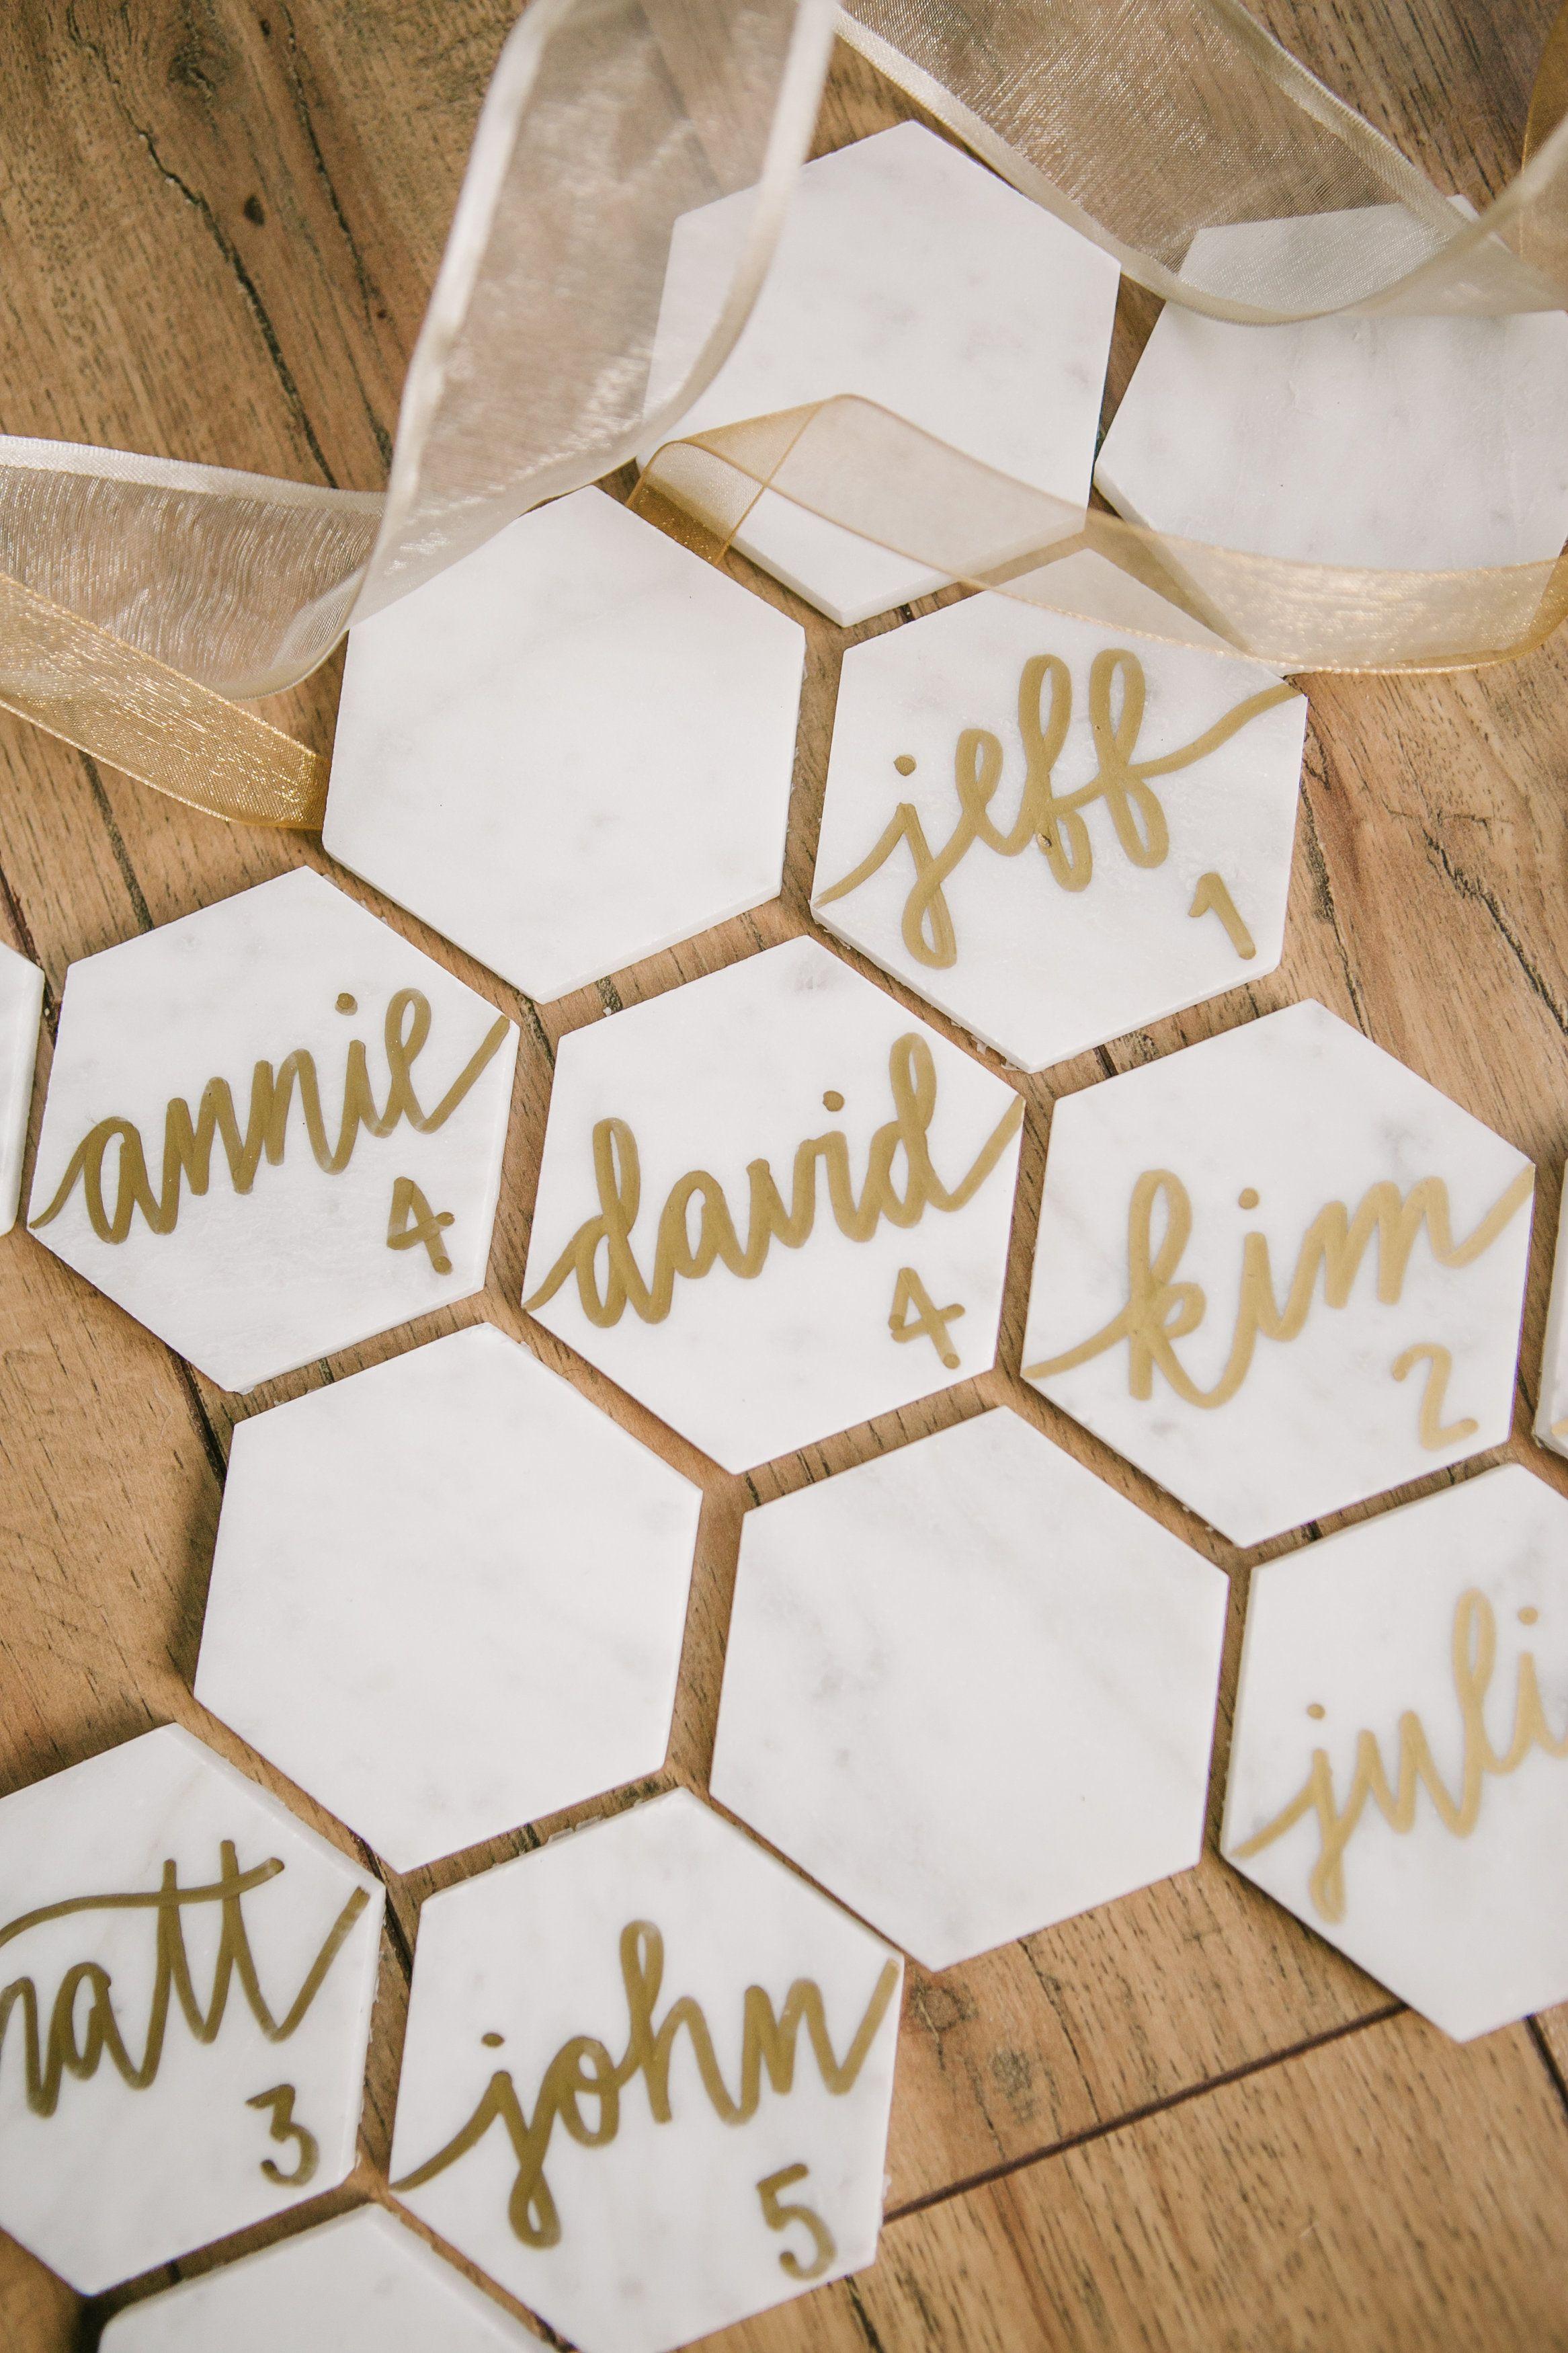 Honey-inspired wedding place cards | Weddings: Details | Pinterest ...